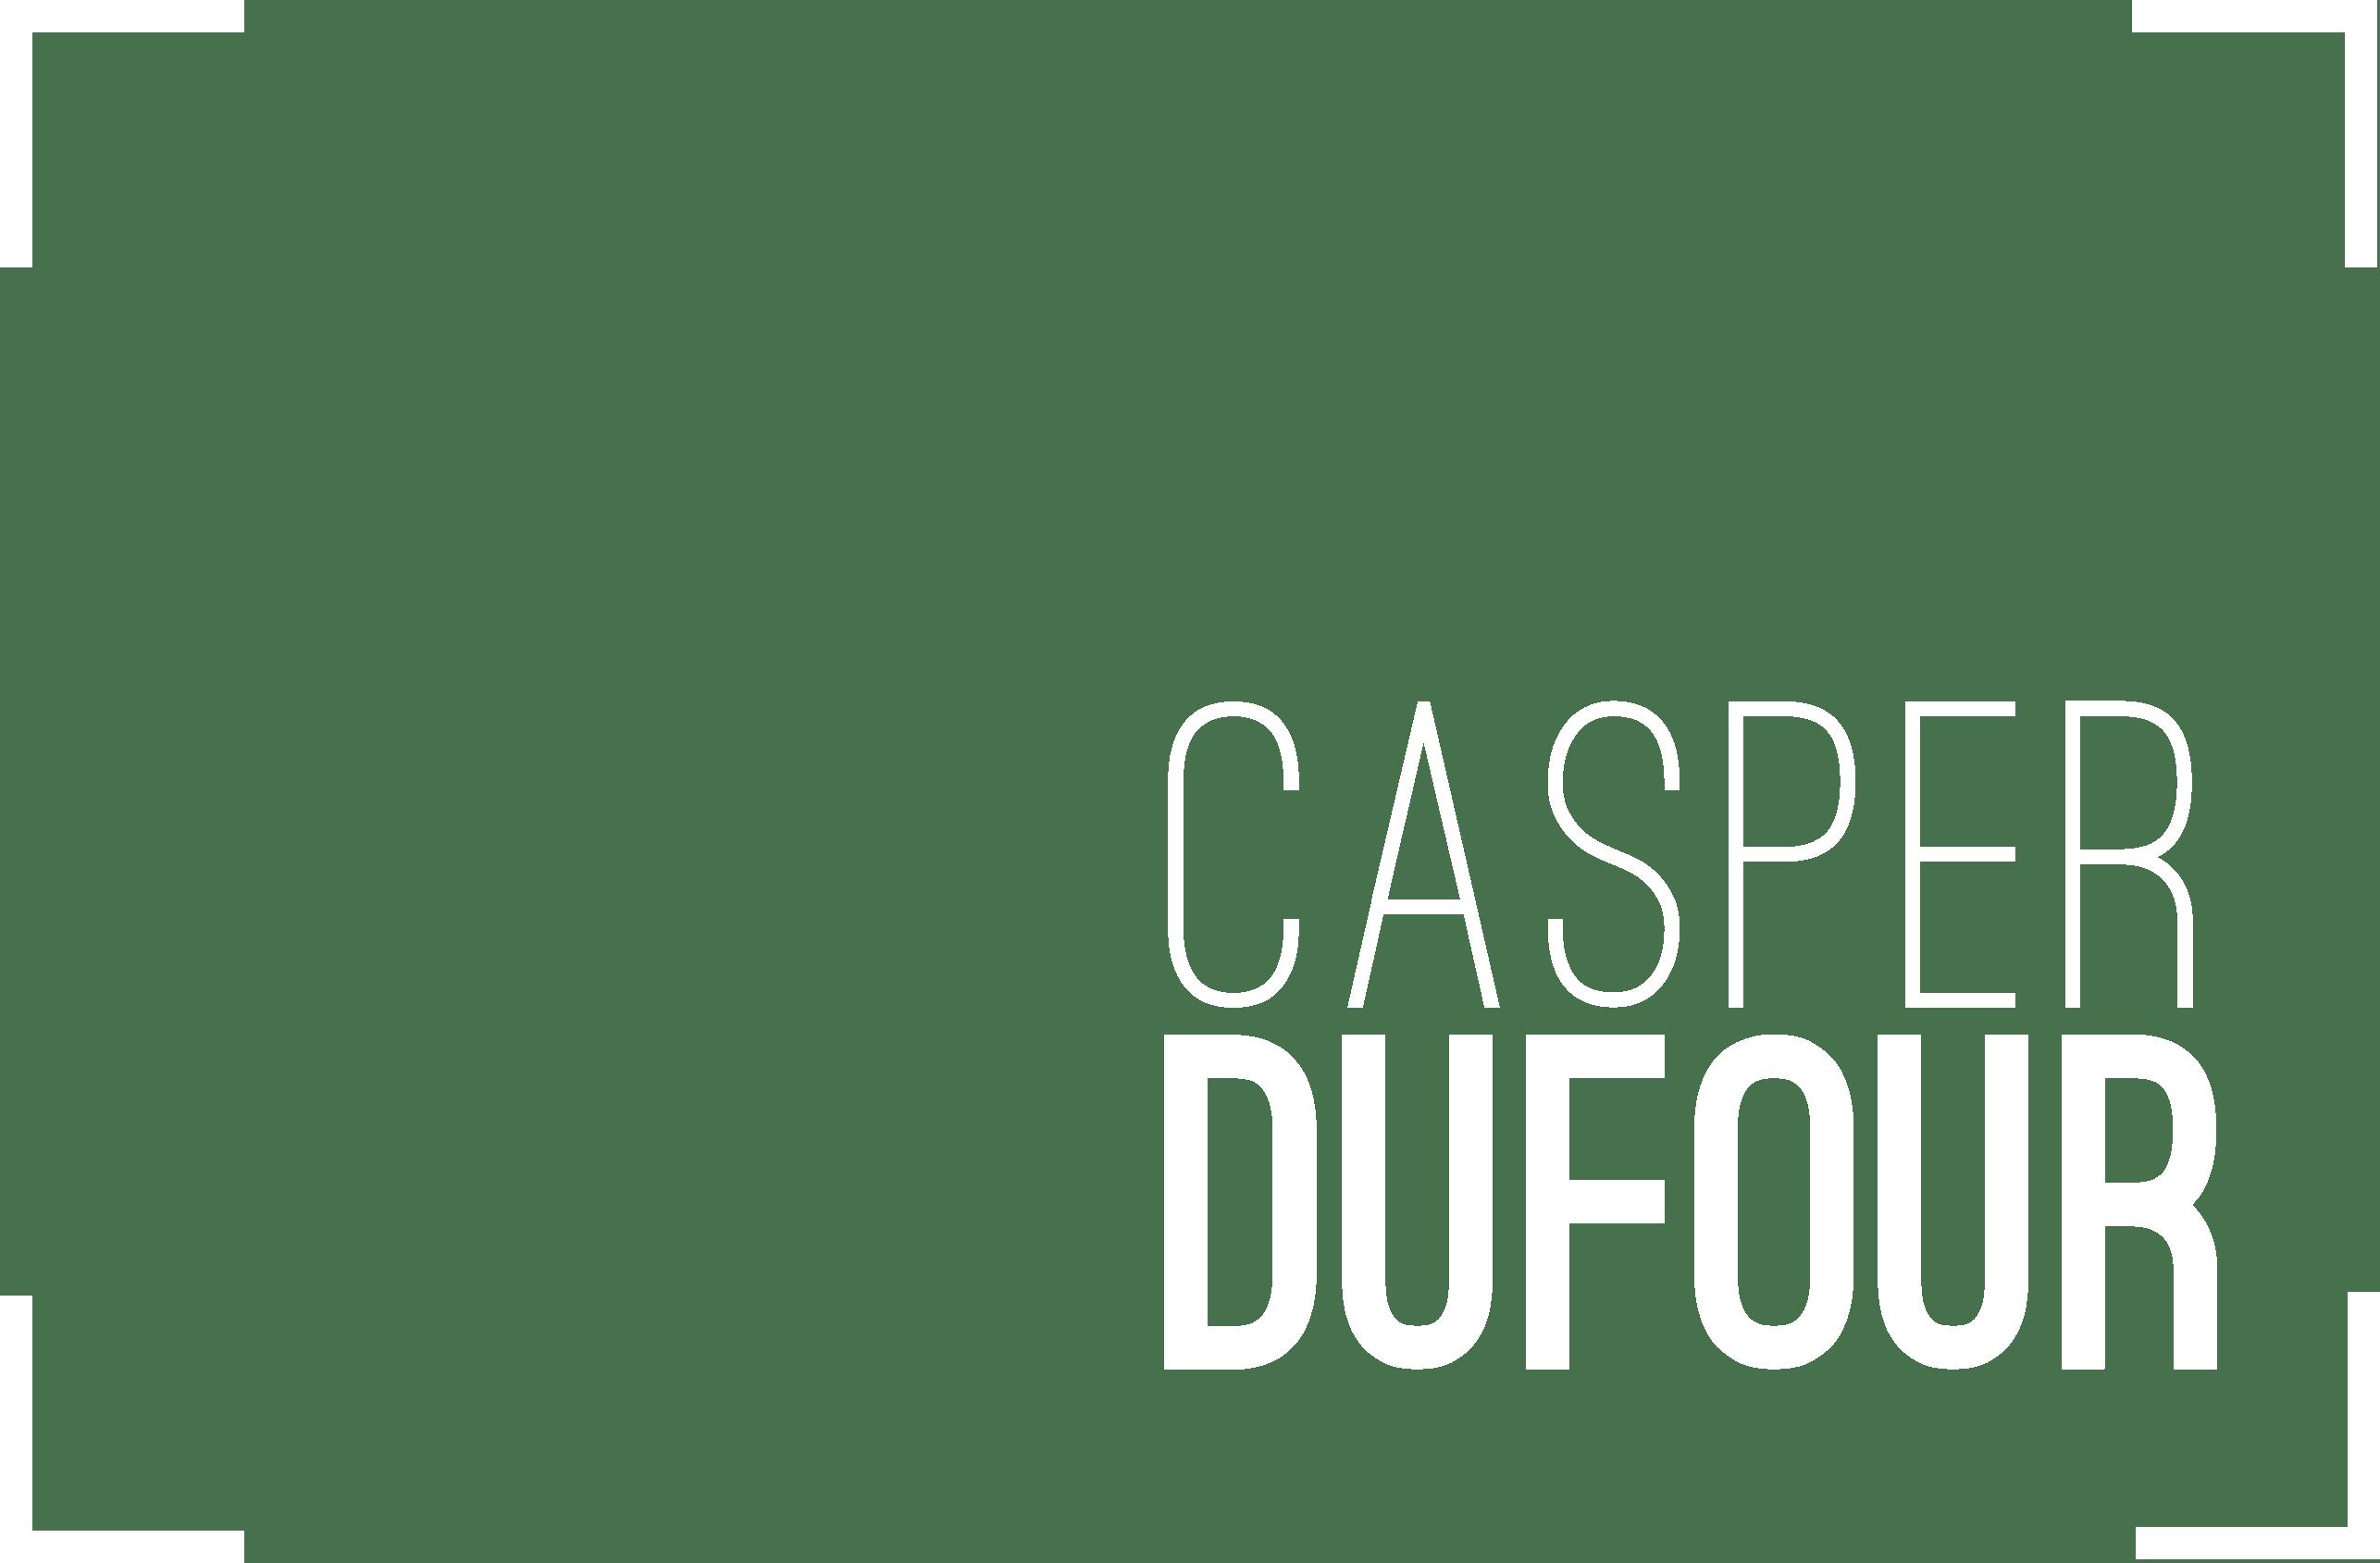 Casper Dufour